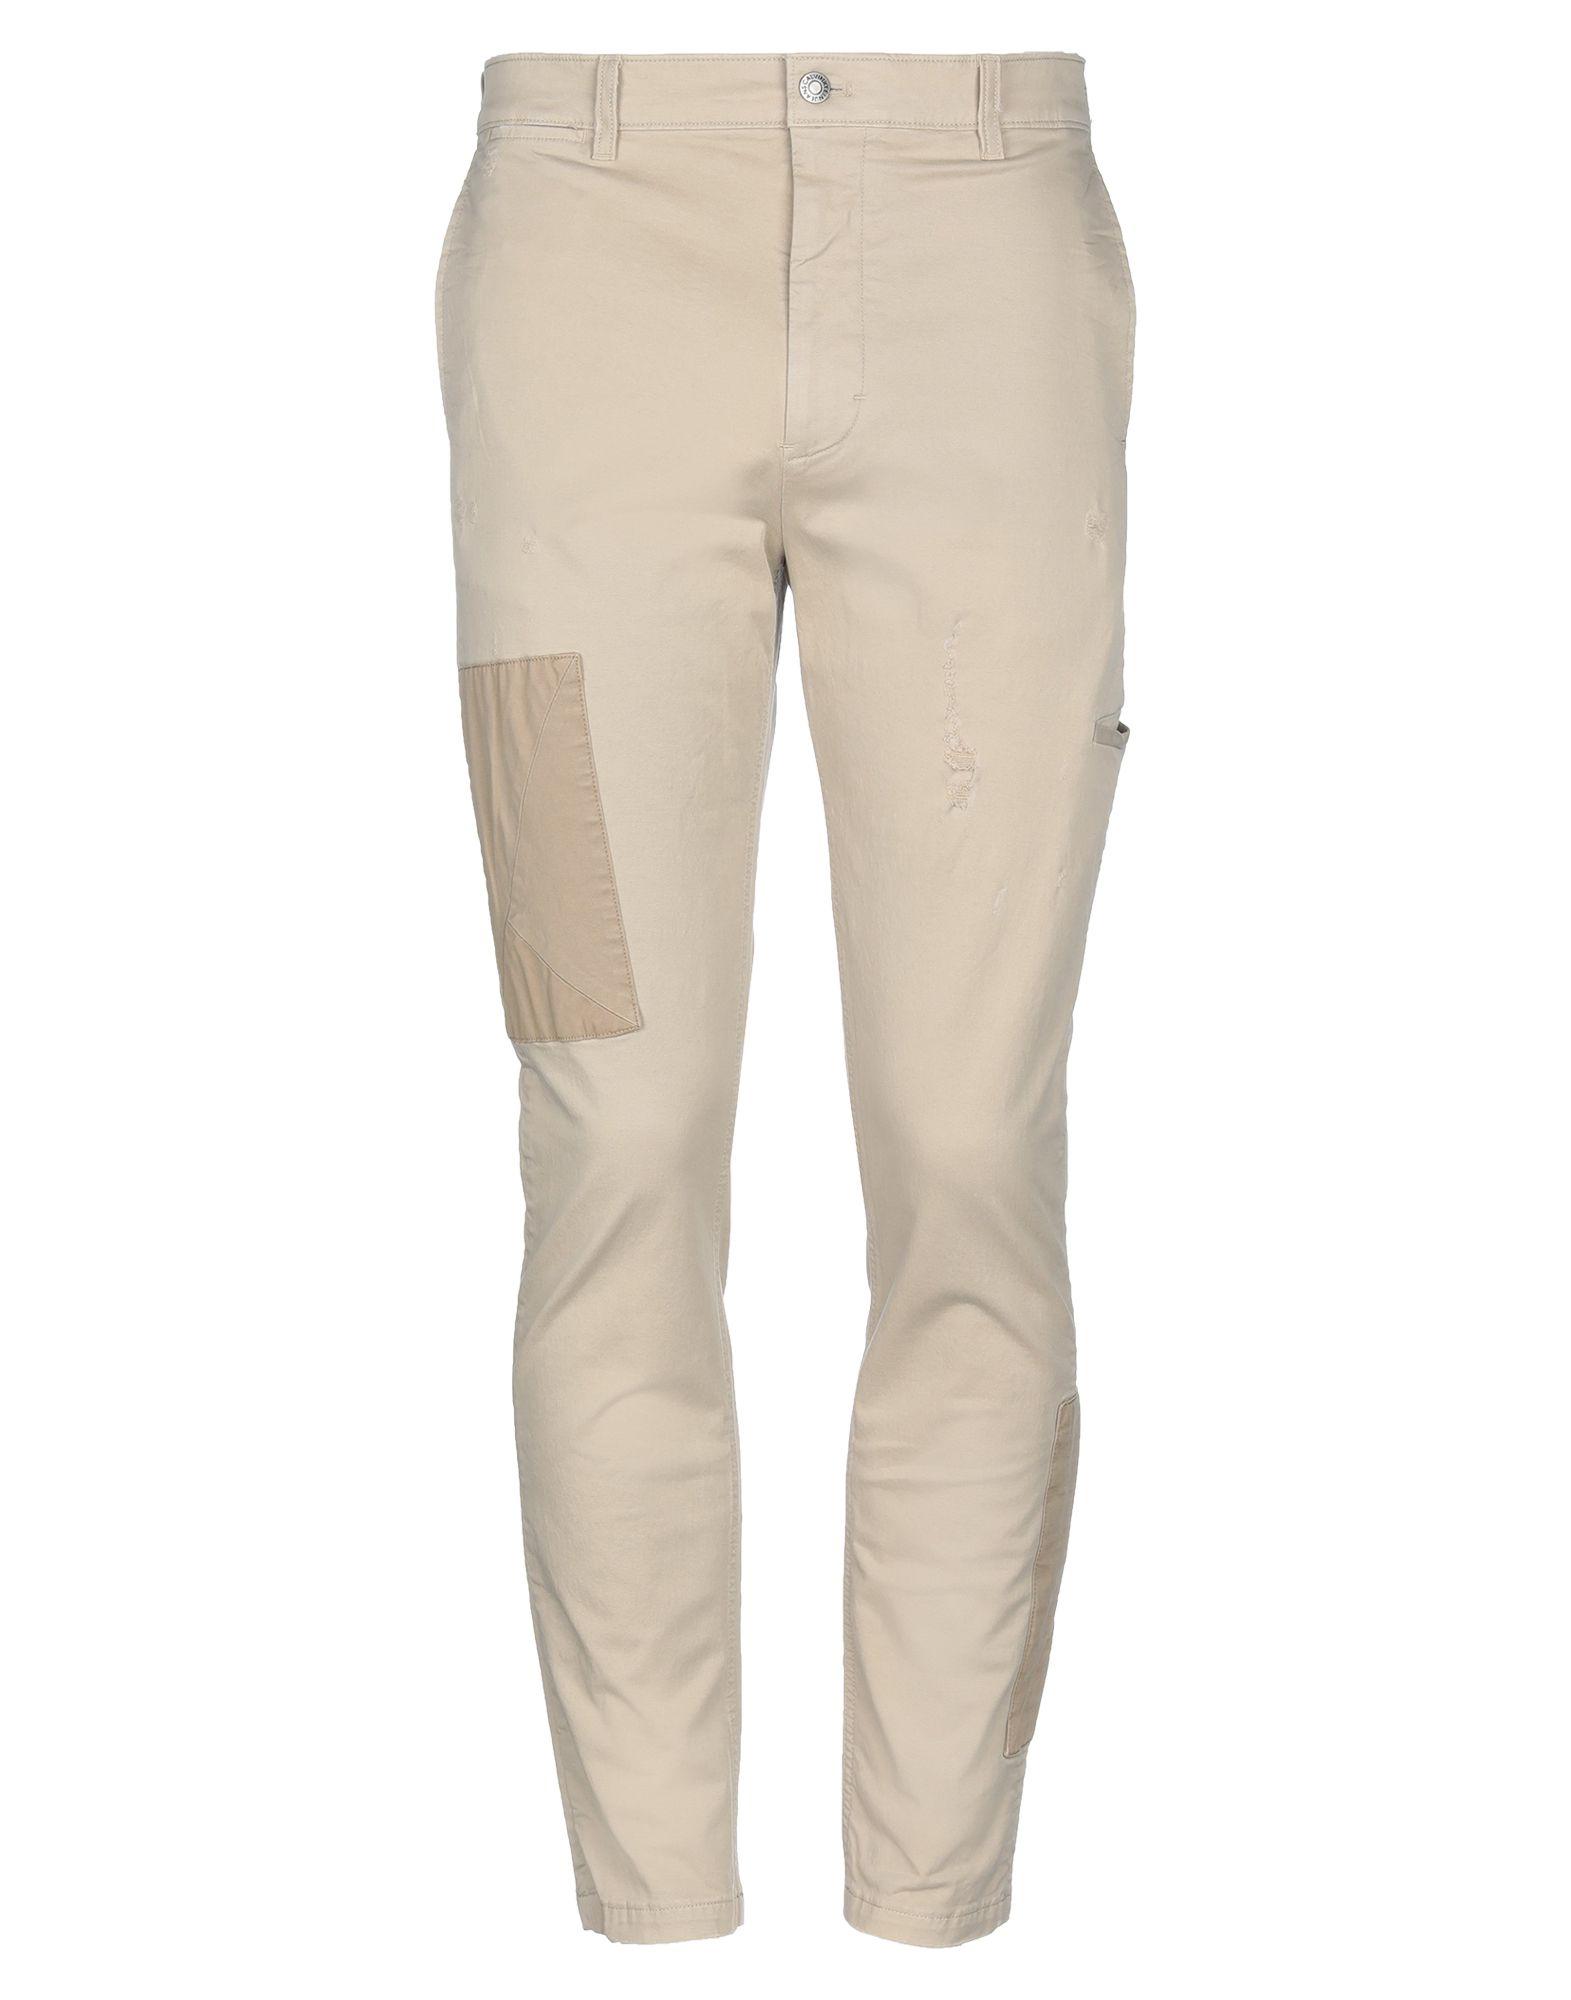 CALVIN KLEIN JEANS Повседневные брюки джинсы мужские calvin klein jeans цвет синий j30j306711 9113 размер 30 32 44 46 32